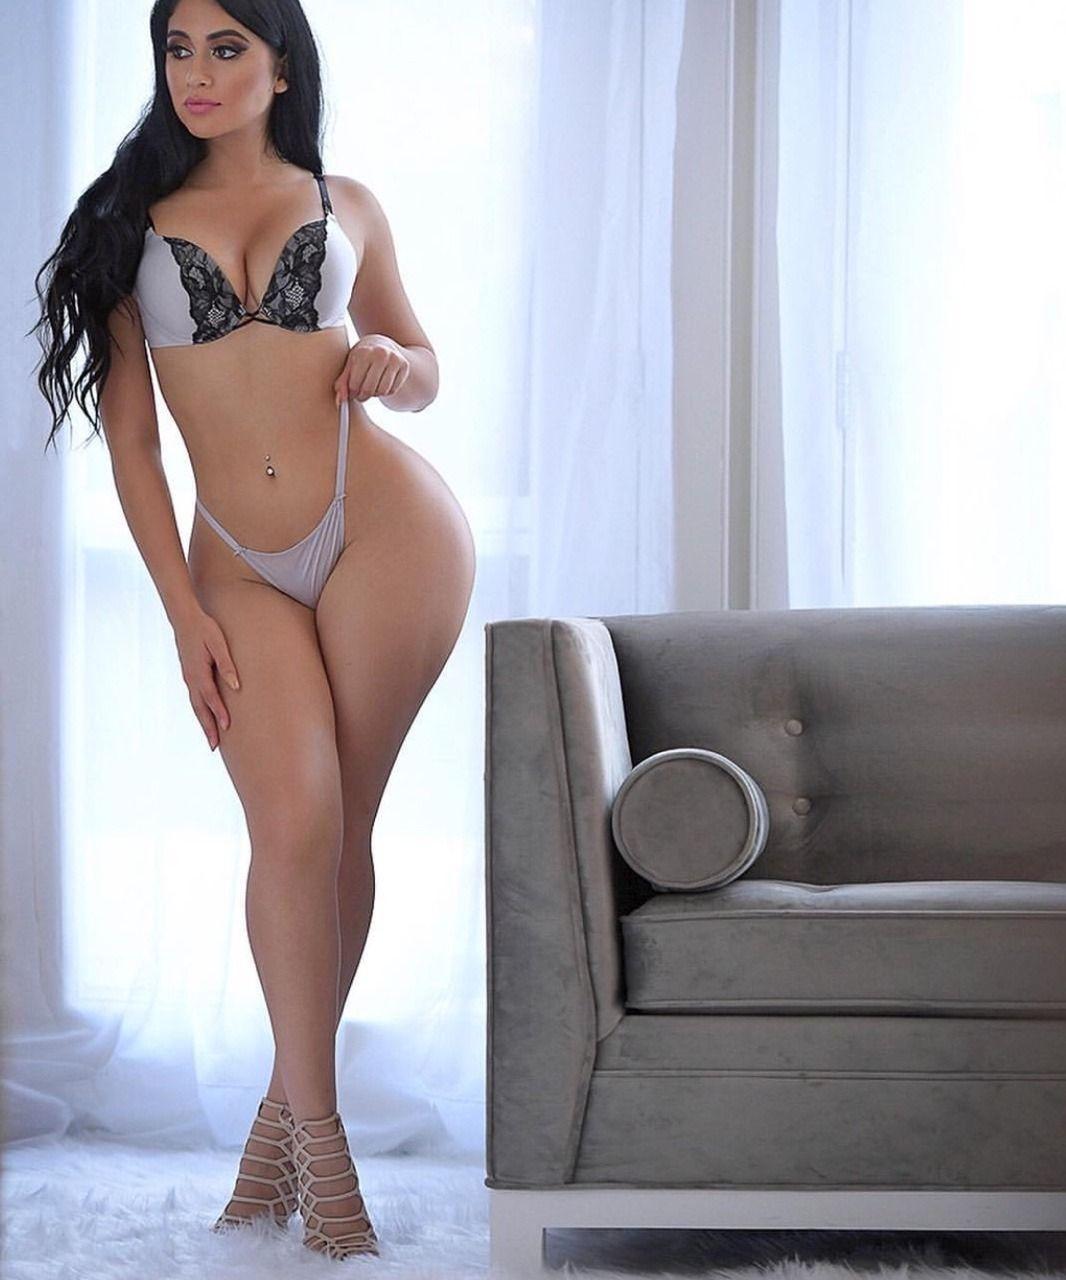 Jailyne Ojeda Ochoa nude (85 photos), pics Sideboobs, iCloud, butt 2019